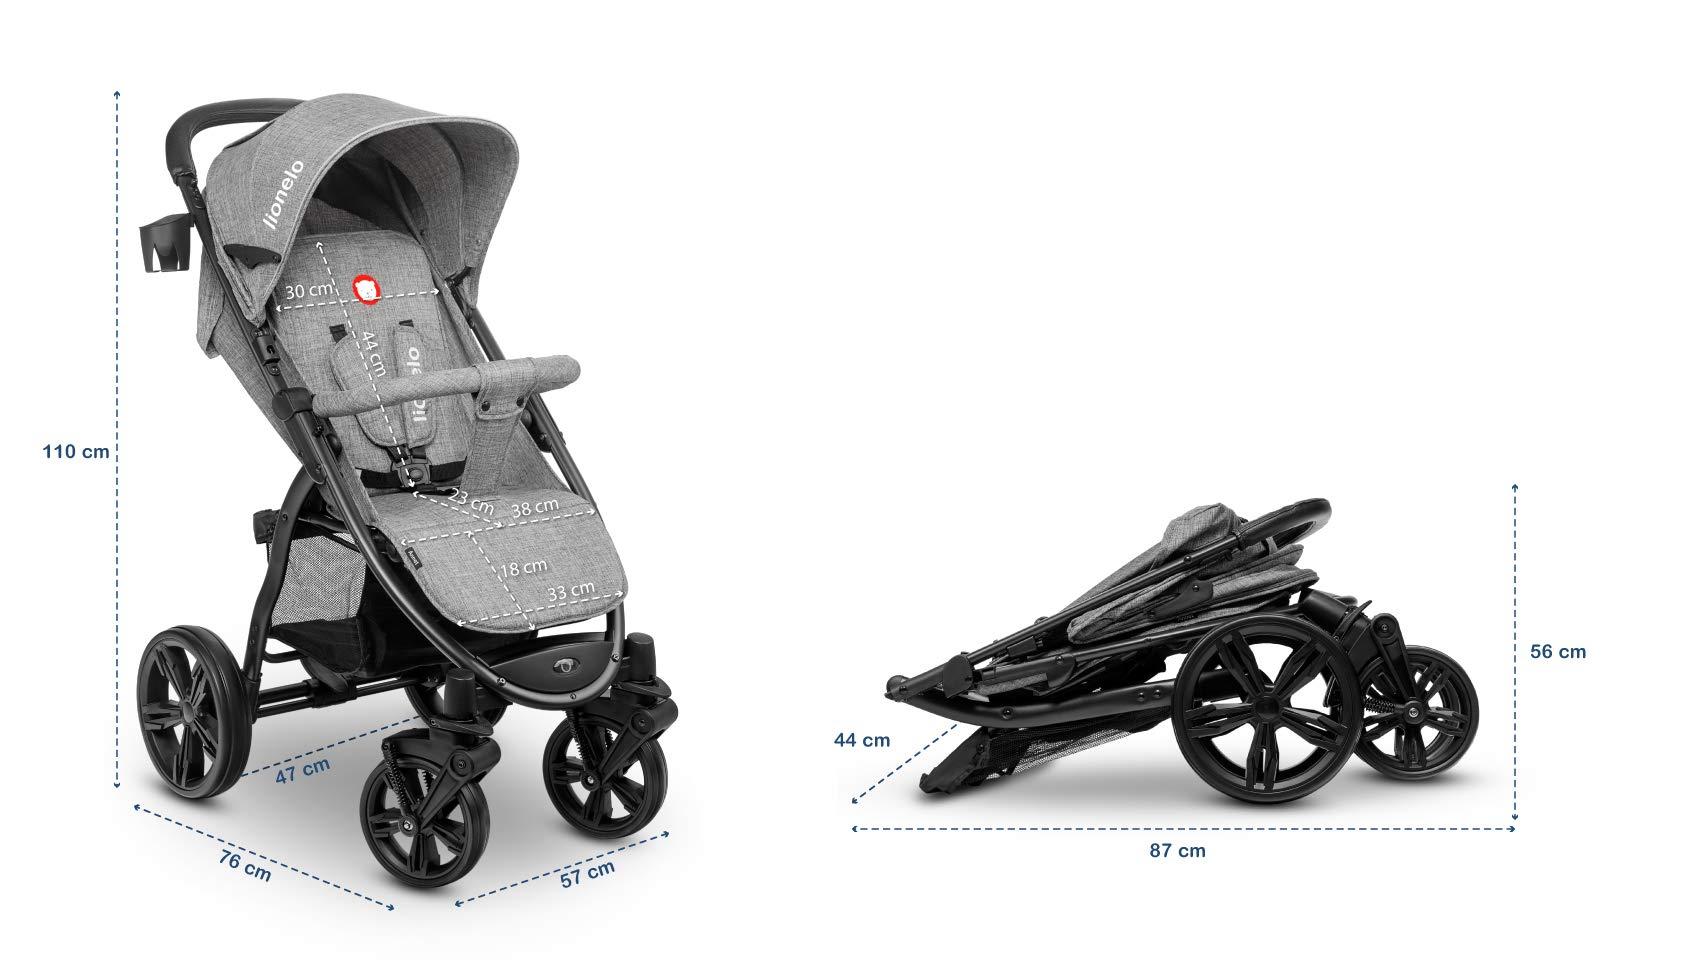 Lionelo 5902581656278 LO-Annet Concrete Stroller Pushchair (Light-Gray)   6